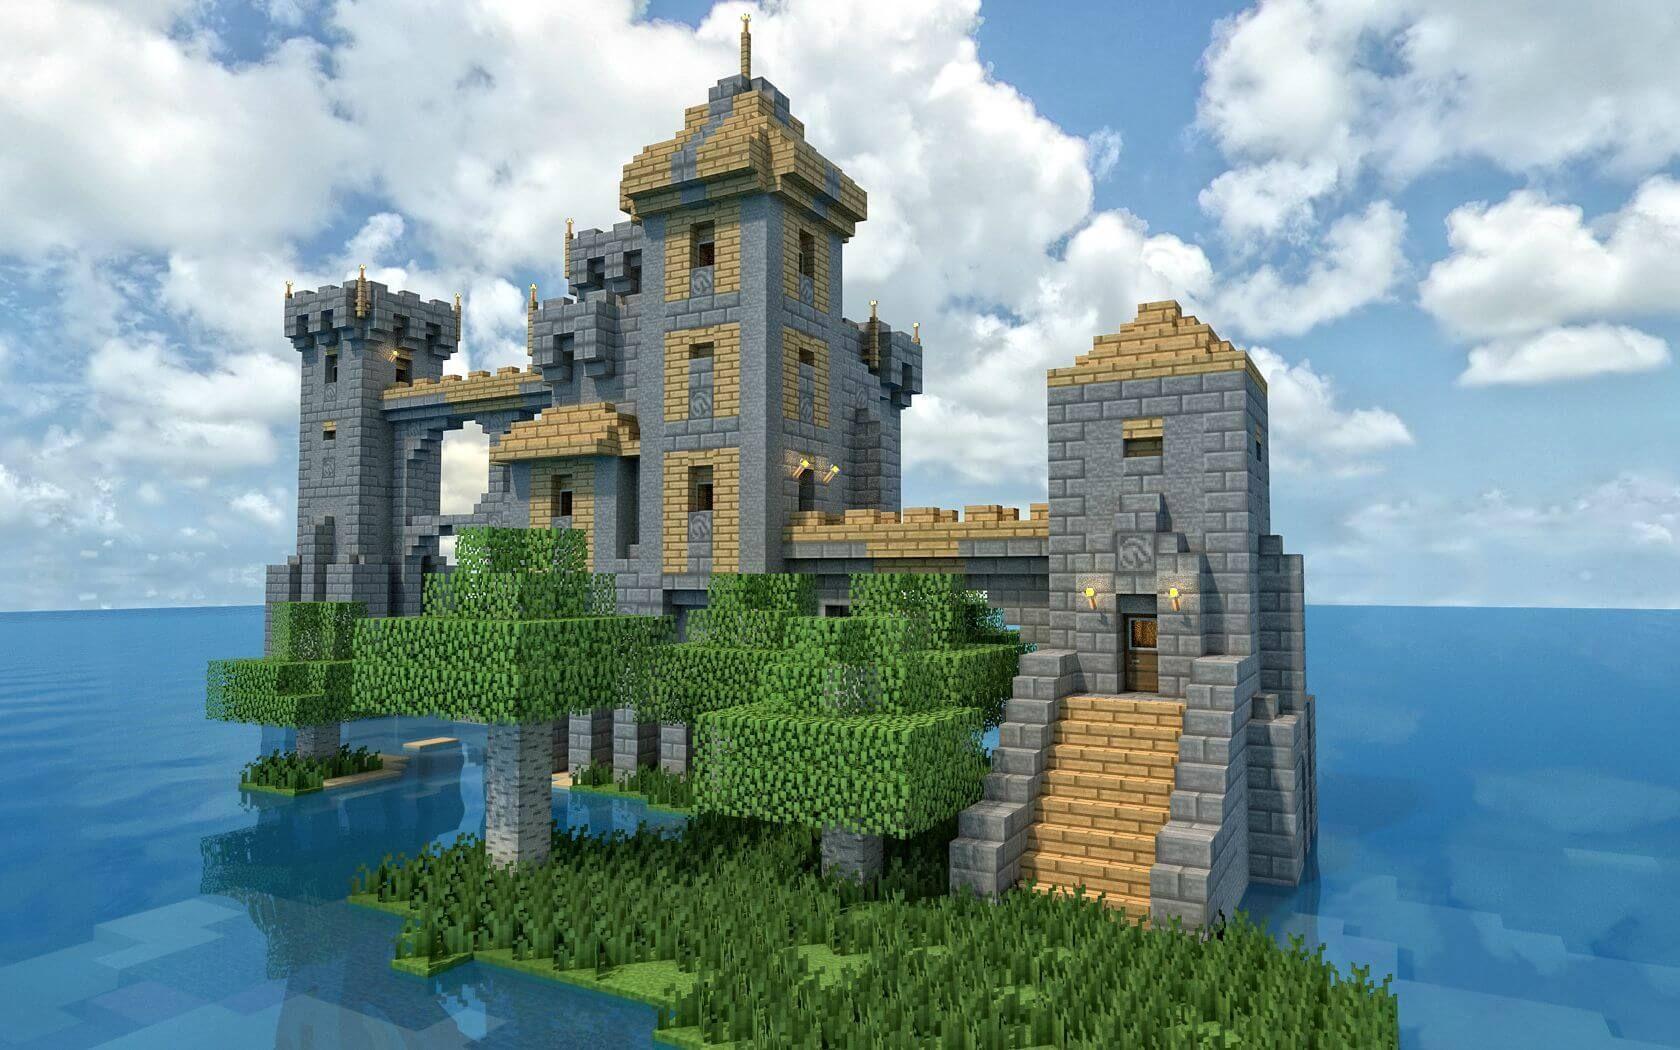 The Island Castle Wallpaper Image Chateau Minecraft Batiment Minecraft Batiments Minecraft